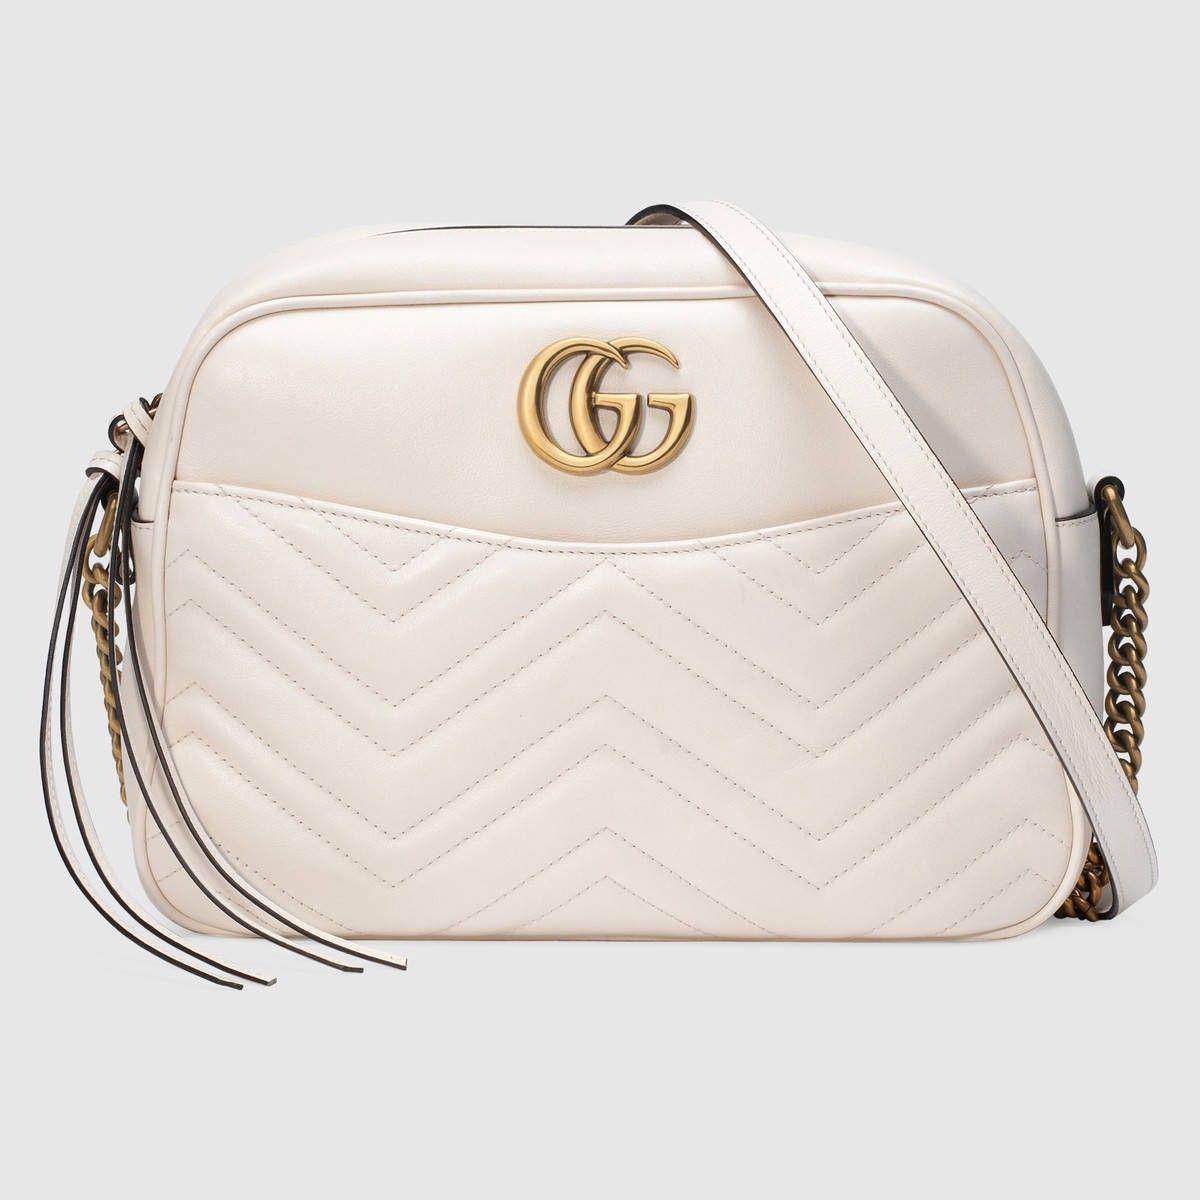 57cb0b9d0b1e White Leather 'Gg Marmont' Matelassé Shoulder Bag, M.White   White ...